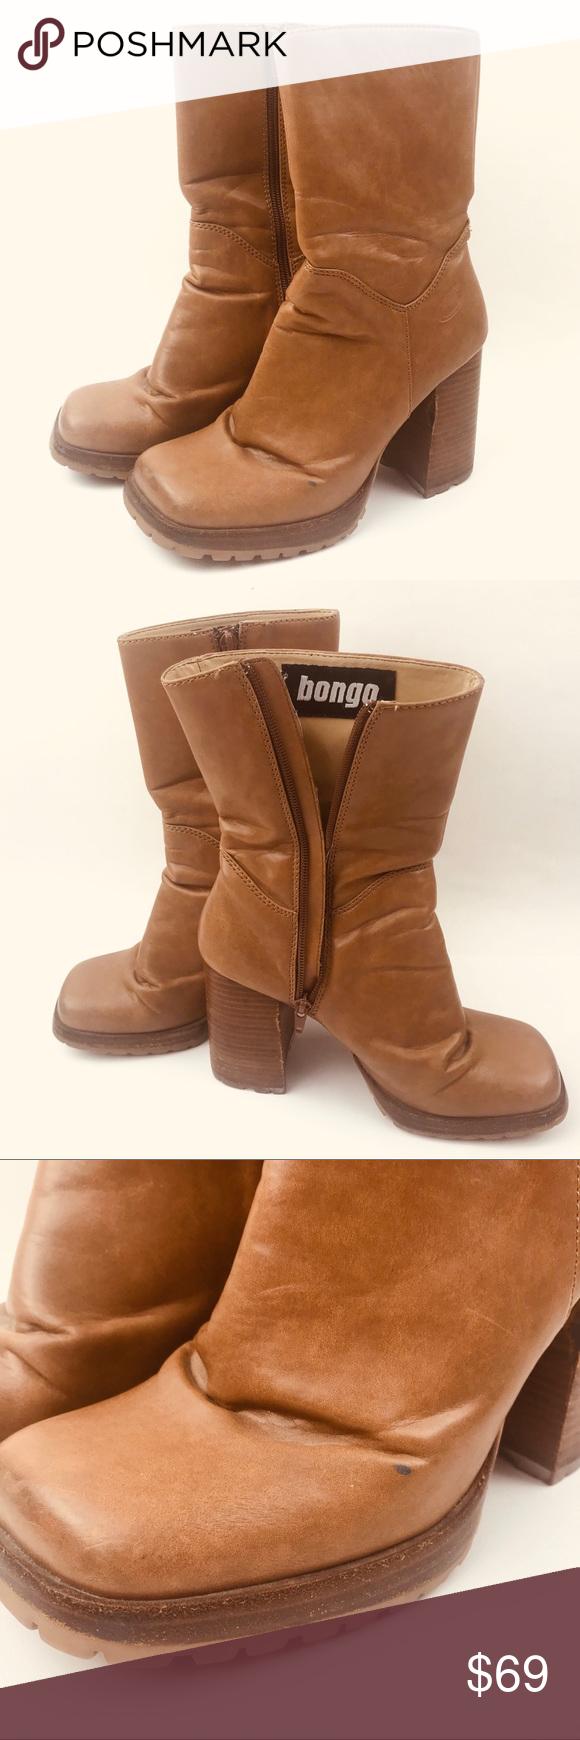 75d0eaca010f Vintage 90s Bongo platform chunky boots hippy Vintage 90s Bongo platform  chunky boots hippy The underside